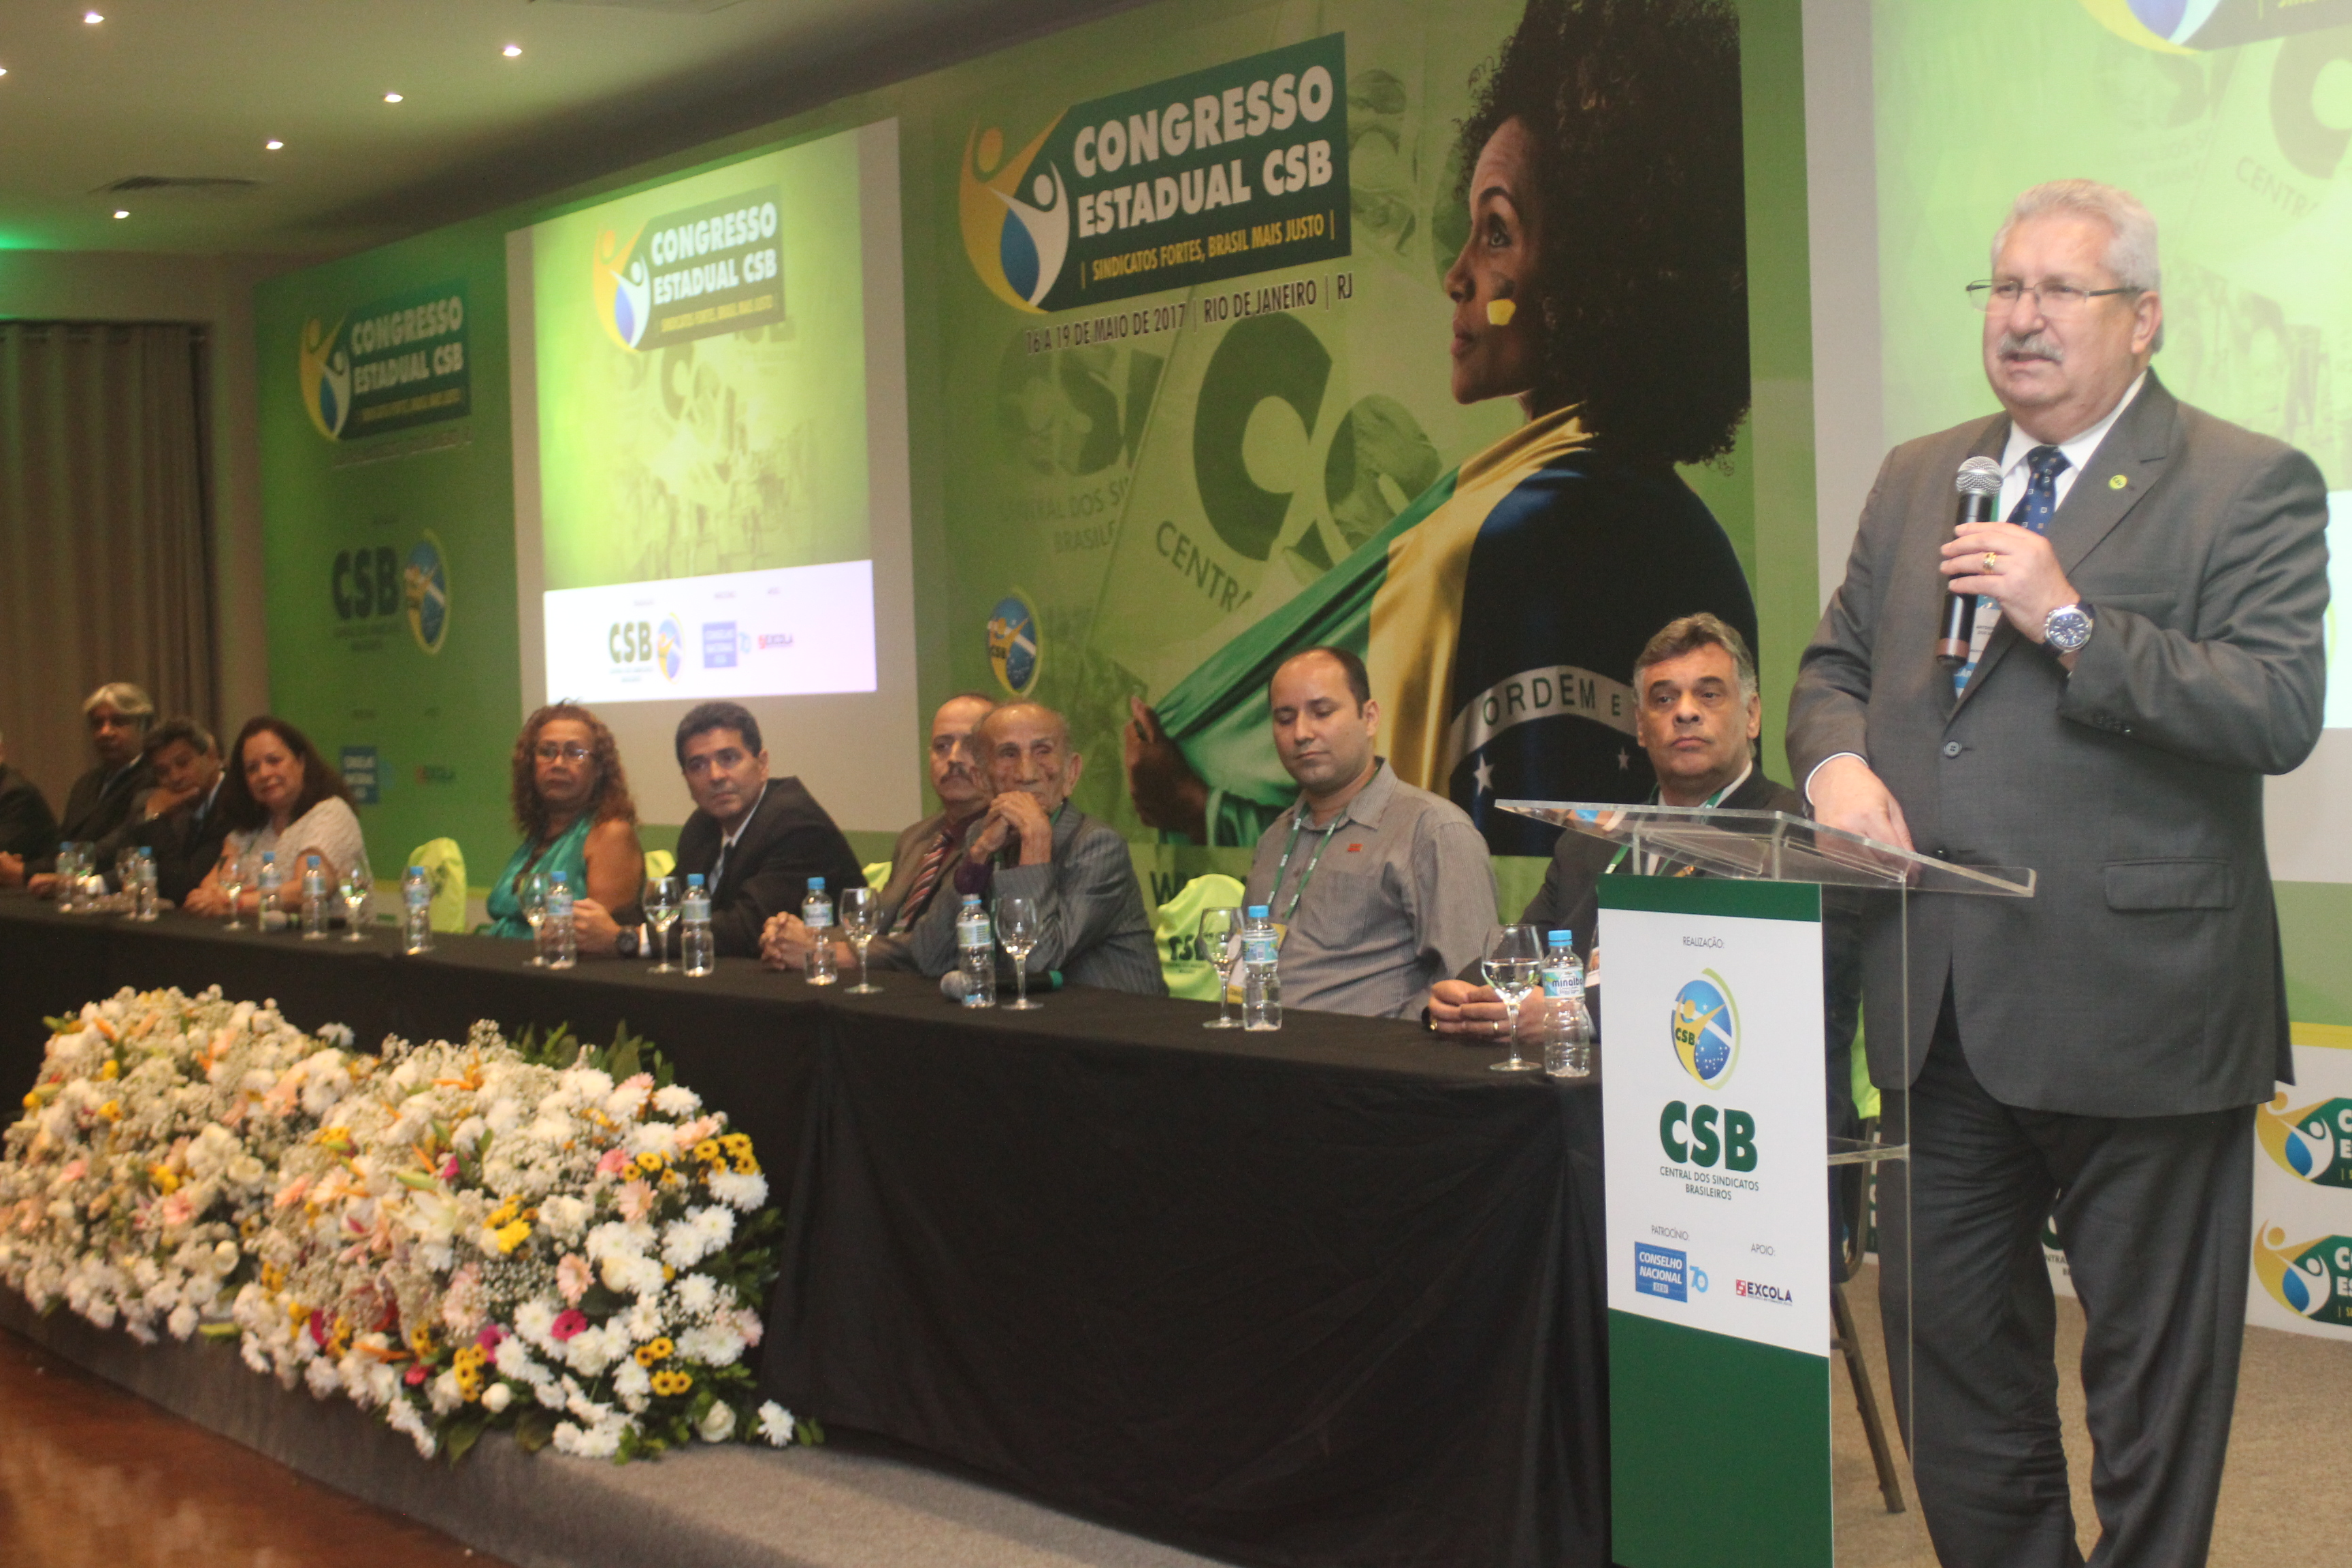 Congresso Estadual do Rio de Janeiro inicia para ampliar a luta da CSB contra as reformas